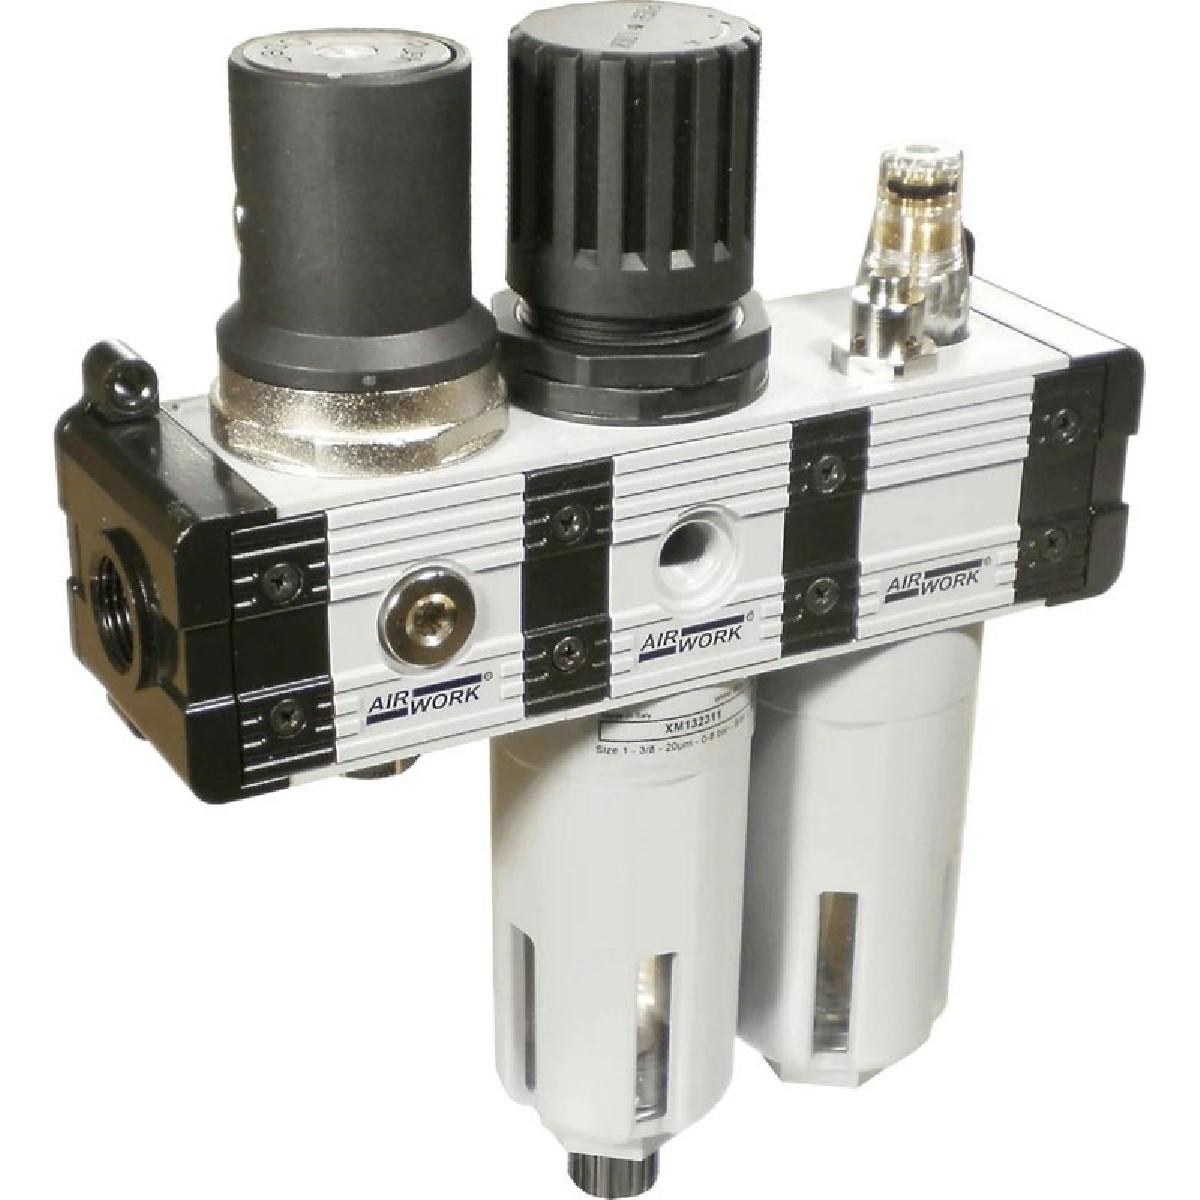 Davair Air treatment - pneumatic combination filters, lubricators and regulators